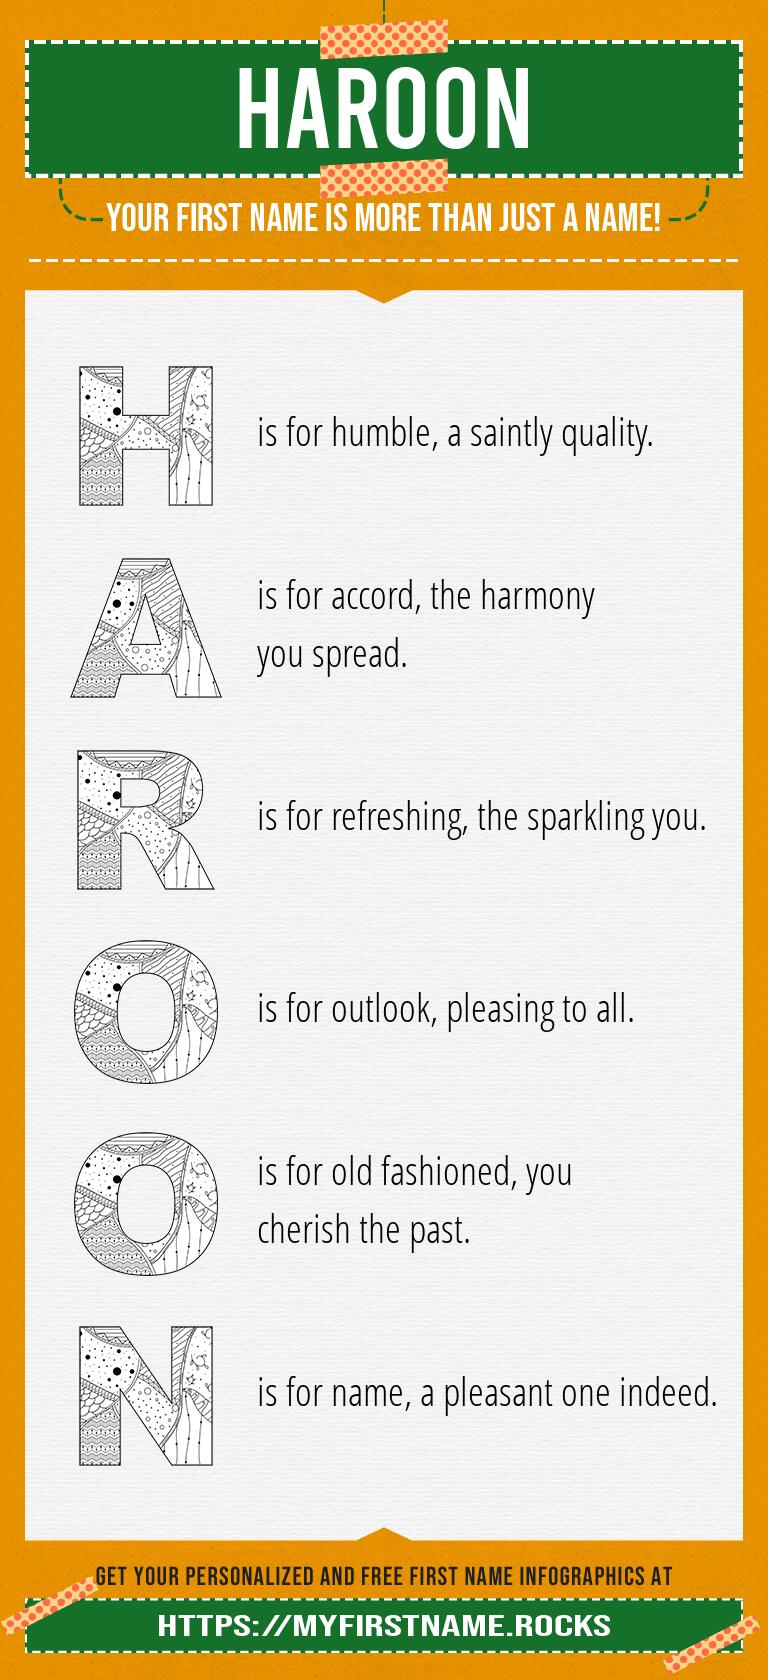 Haroon Infographics